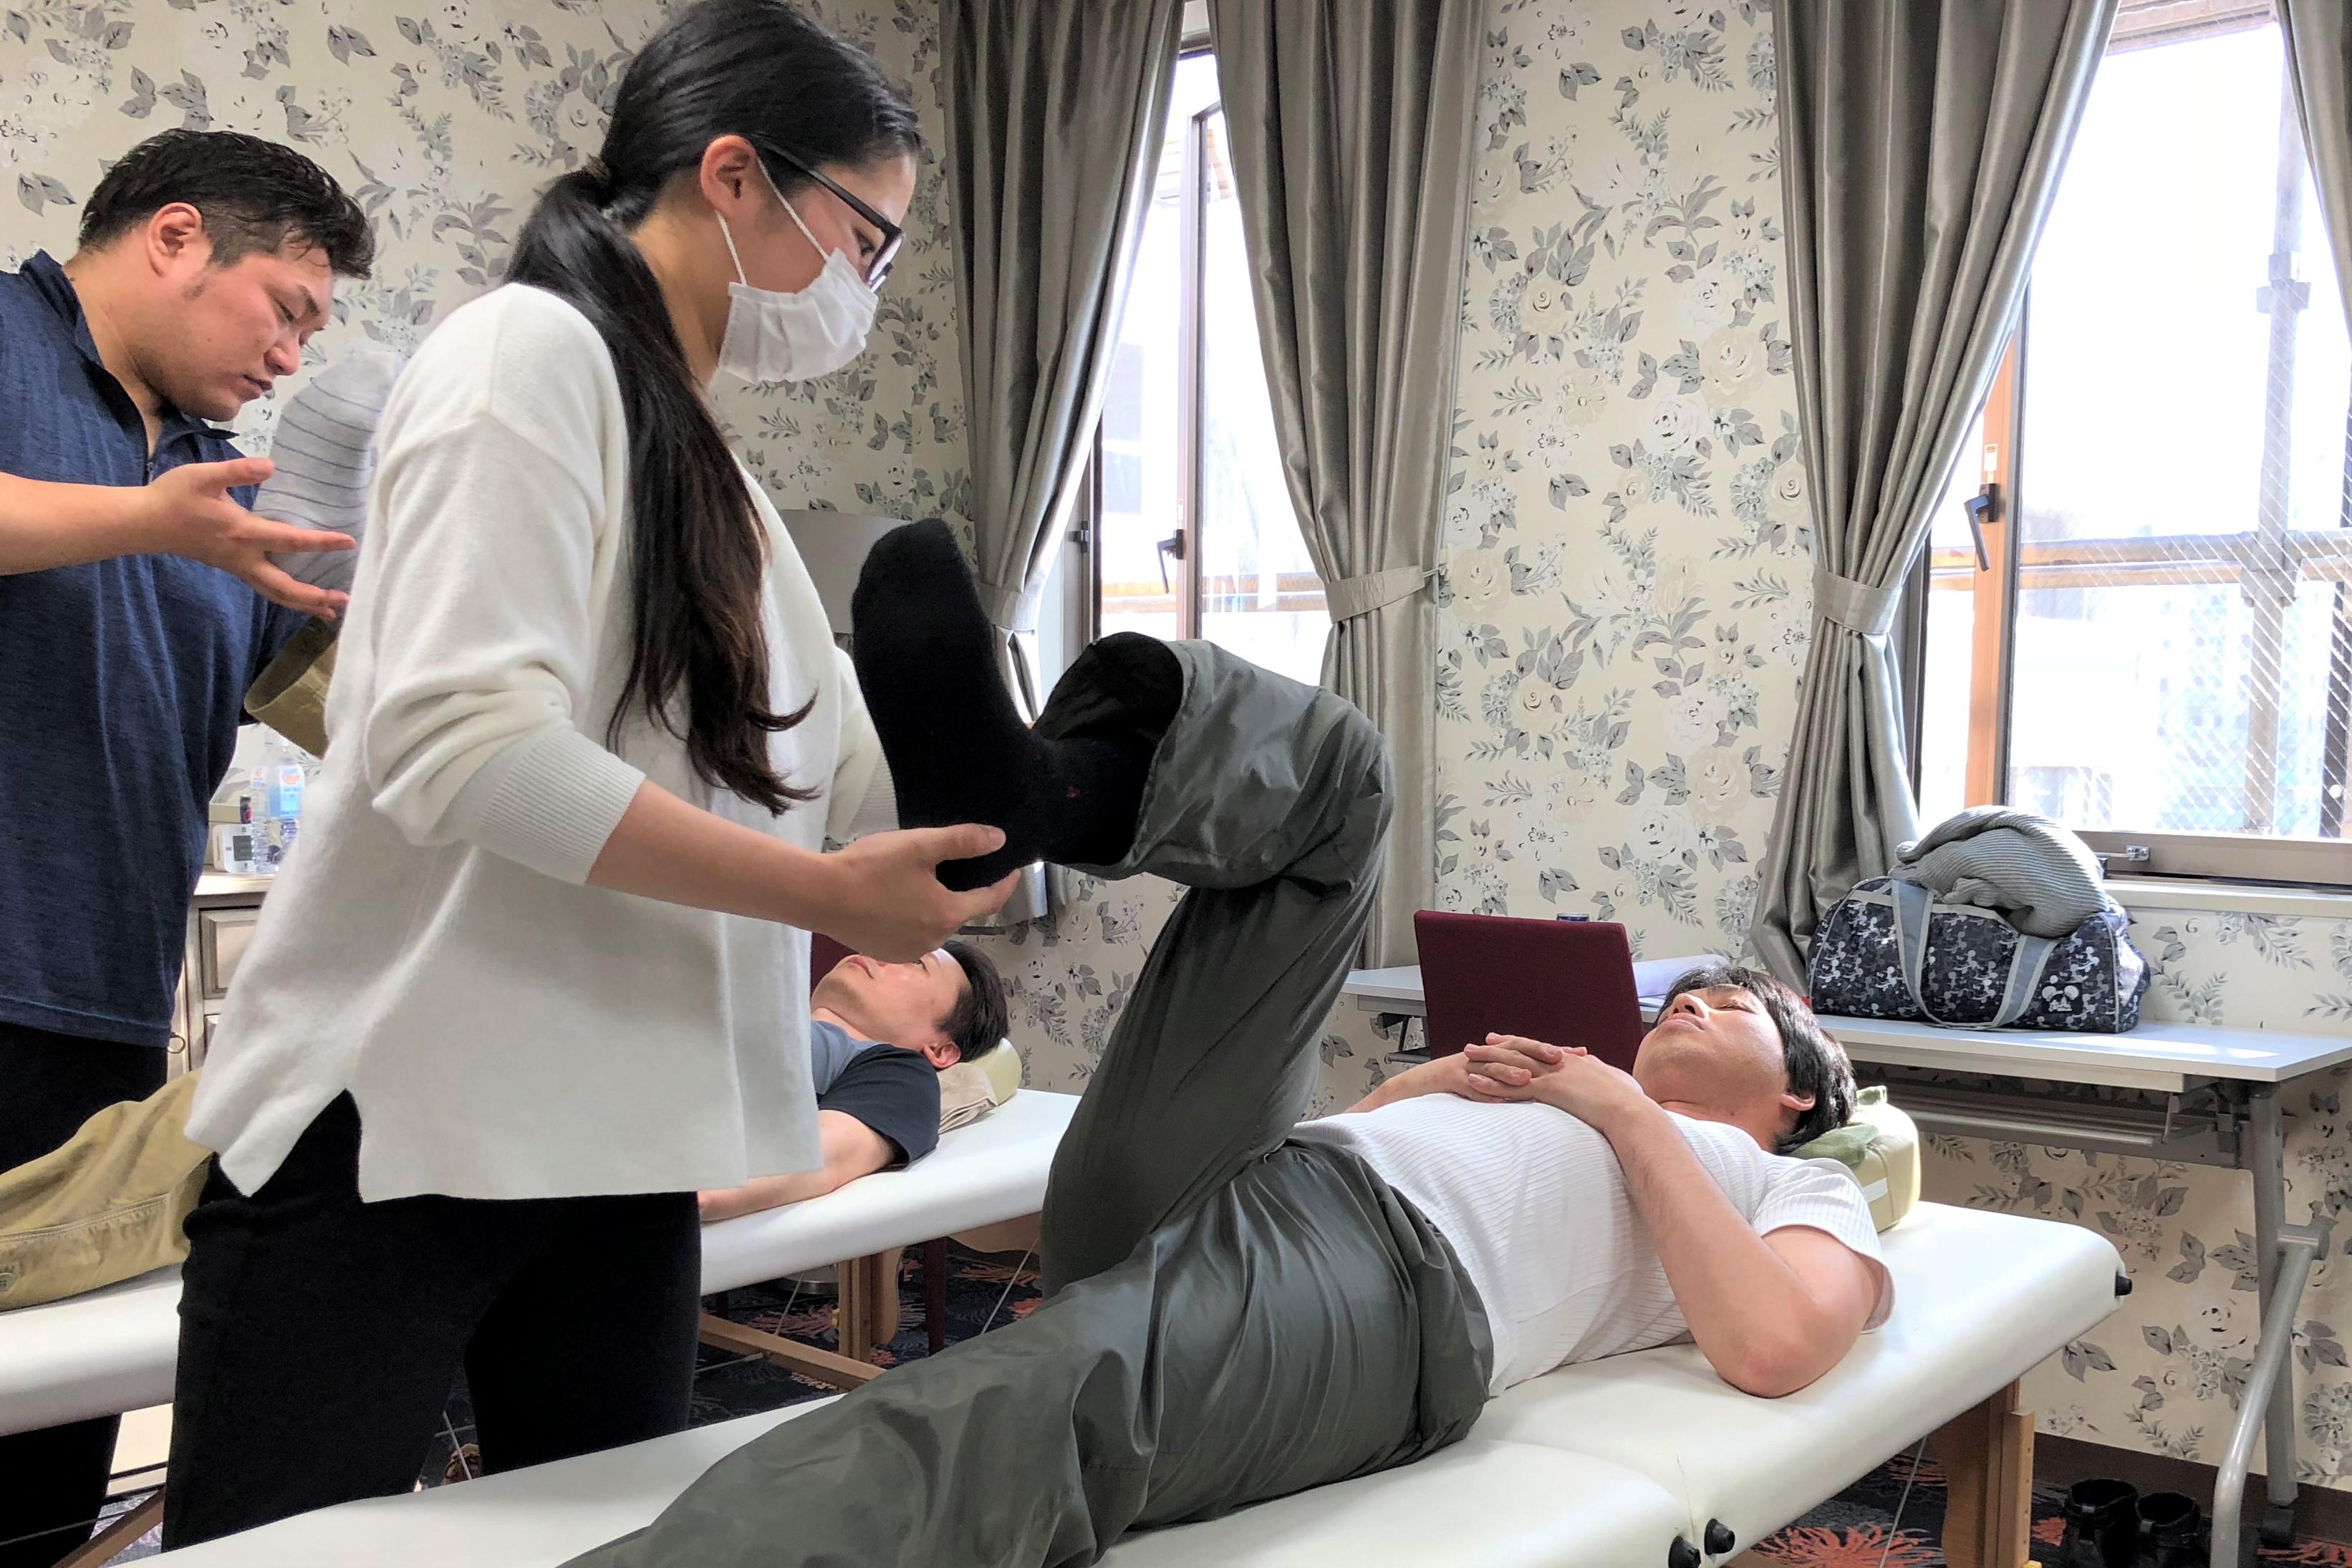 AKSセミナー初日、AKA仙腸関節評価法の練習